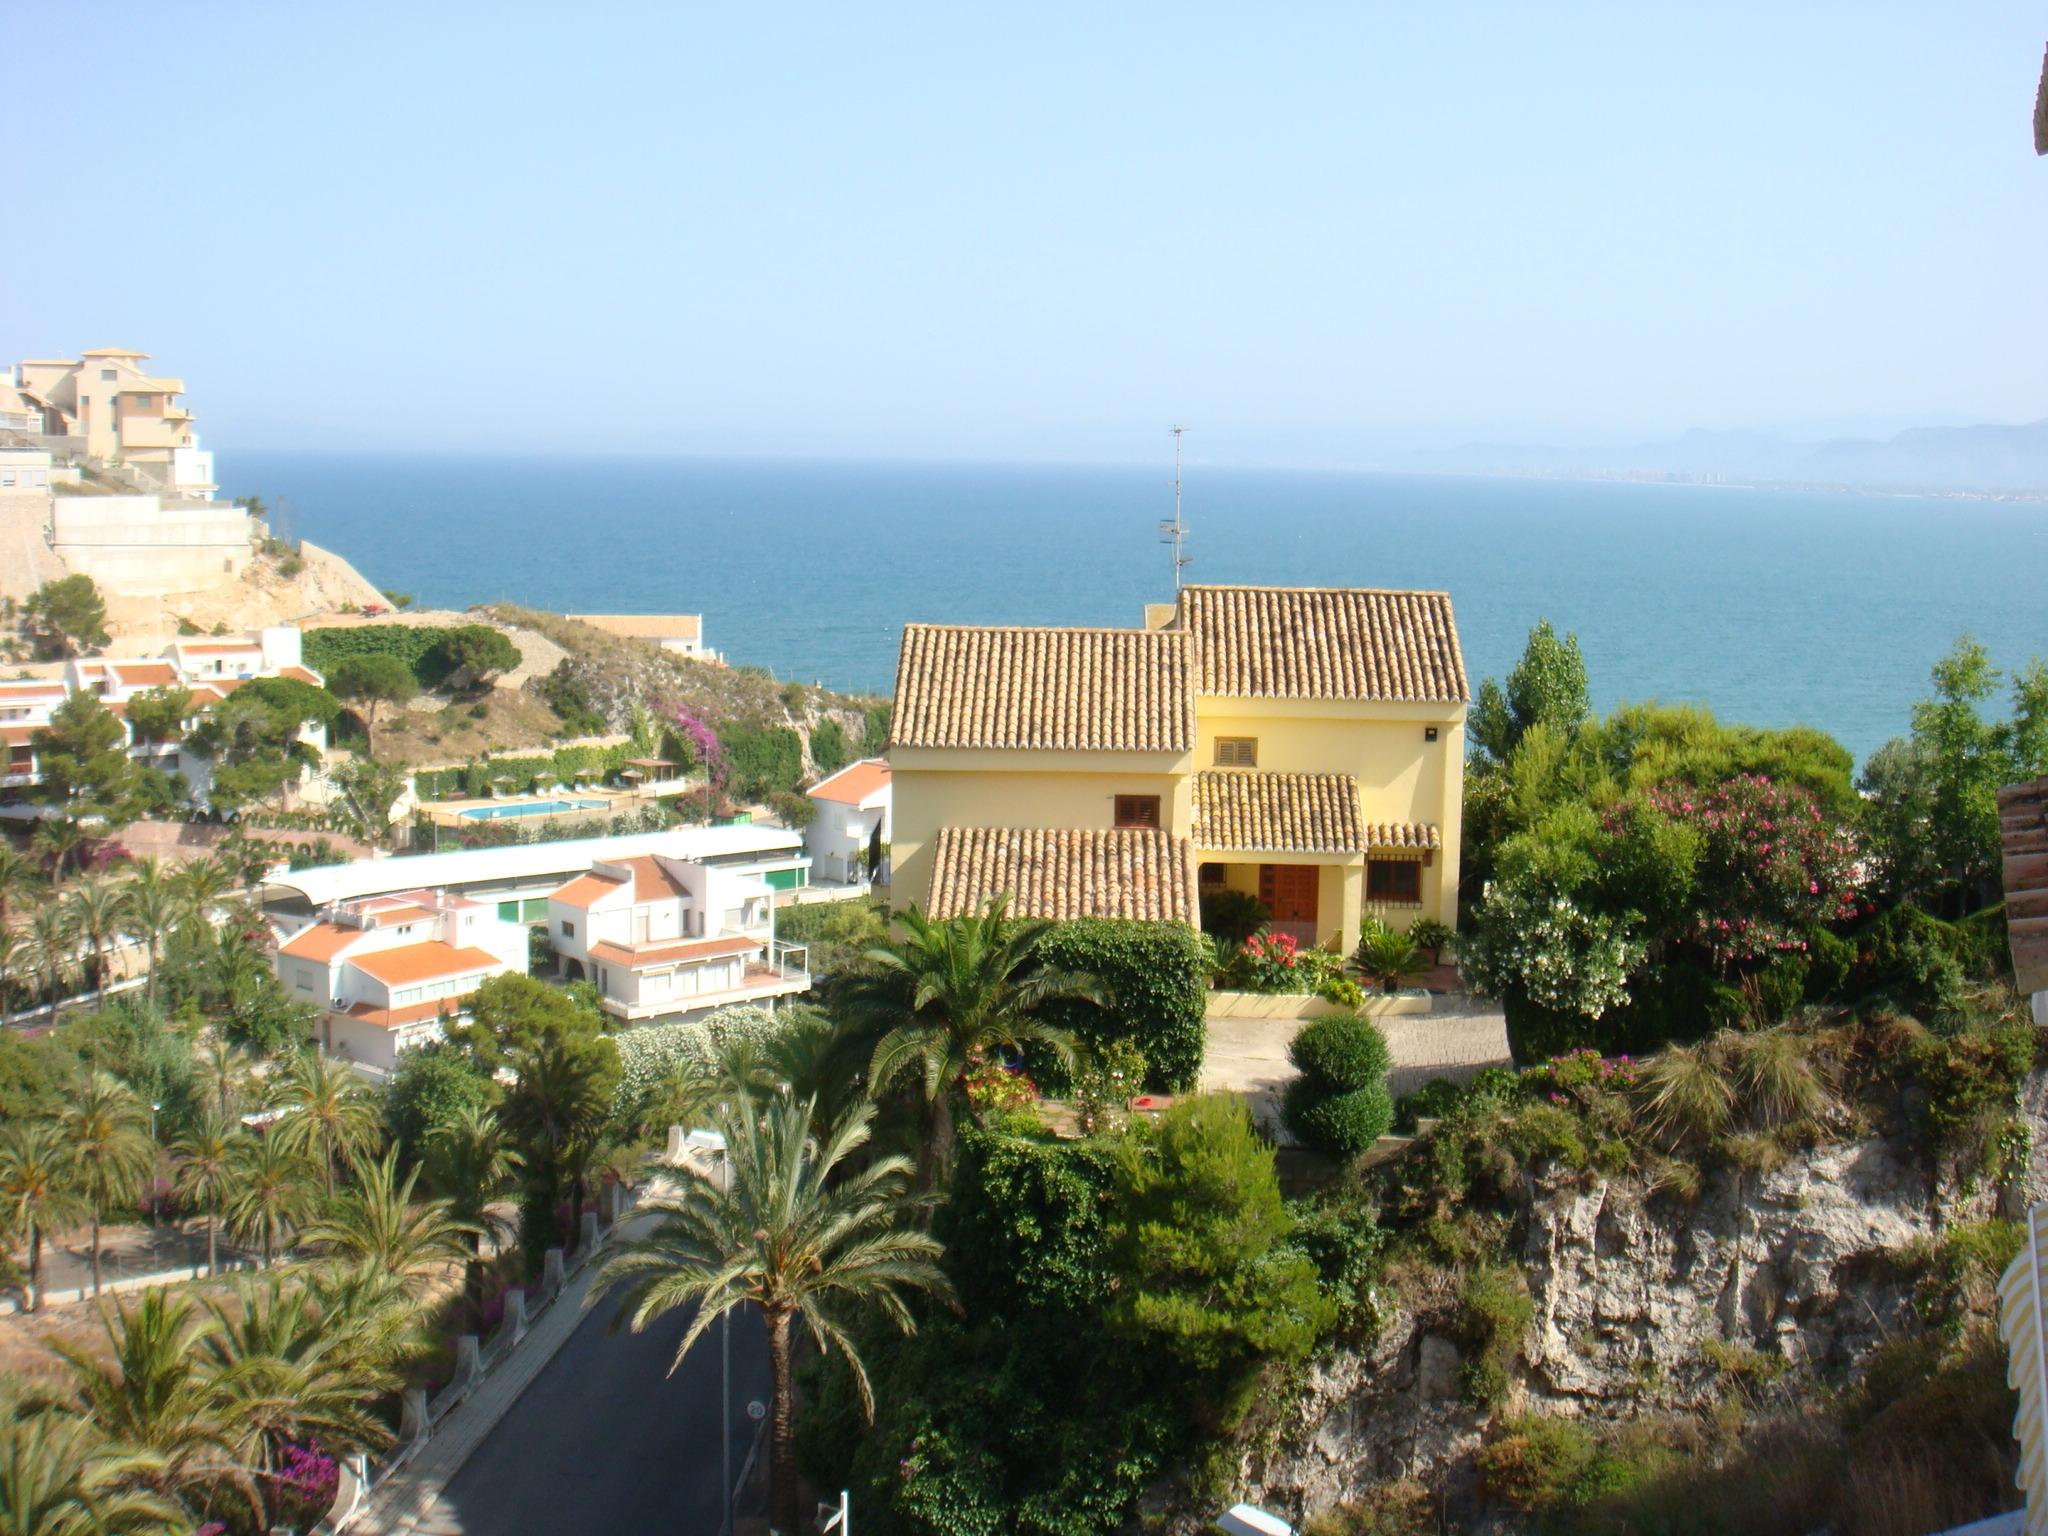 Inmobiliaria gestitur apartamento en zona cap blanc cap blanc 3528 apartamento en zona cap - Venta apartamentos playa cullera ...